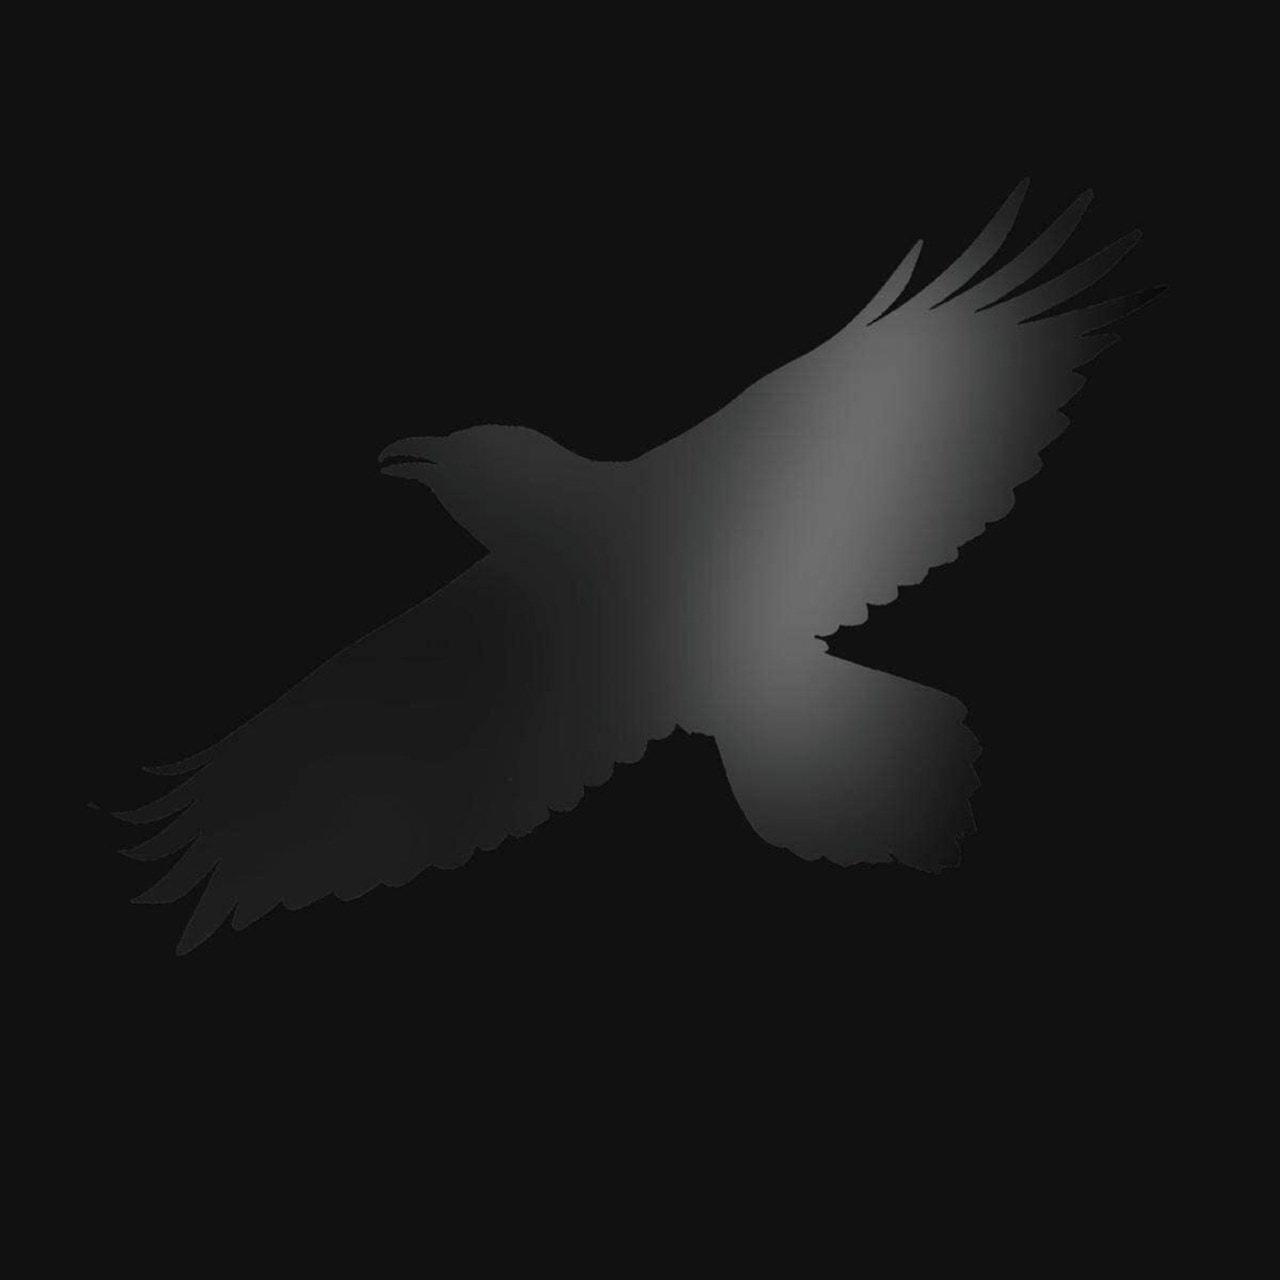 Odin's Raven Magic - 1